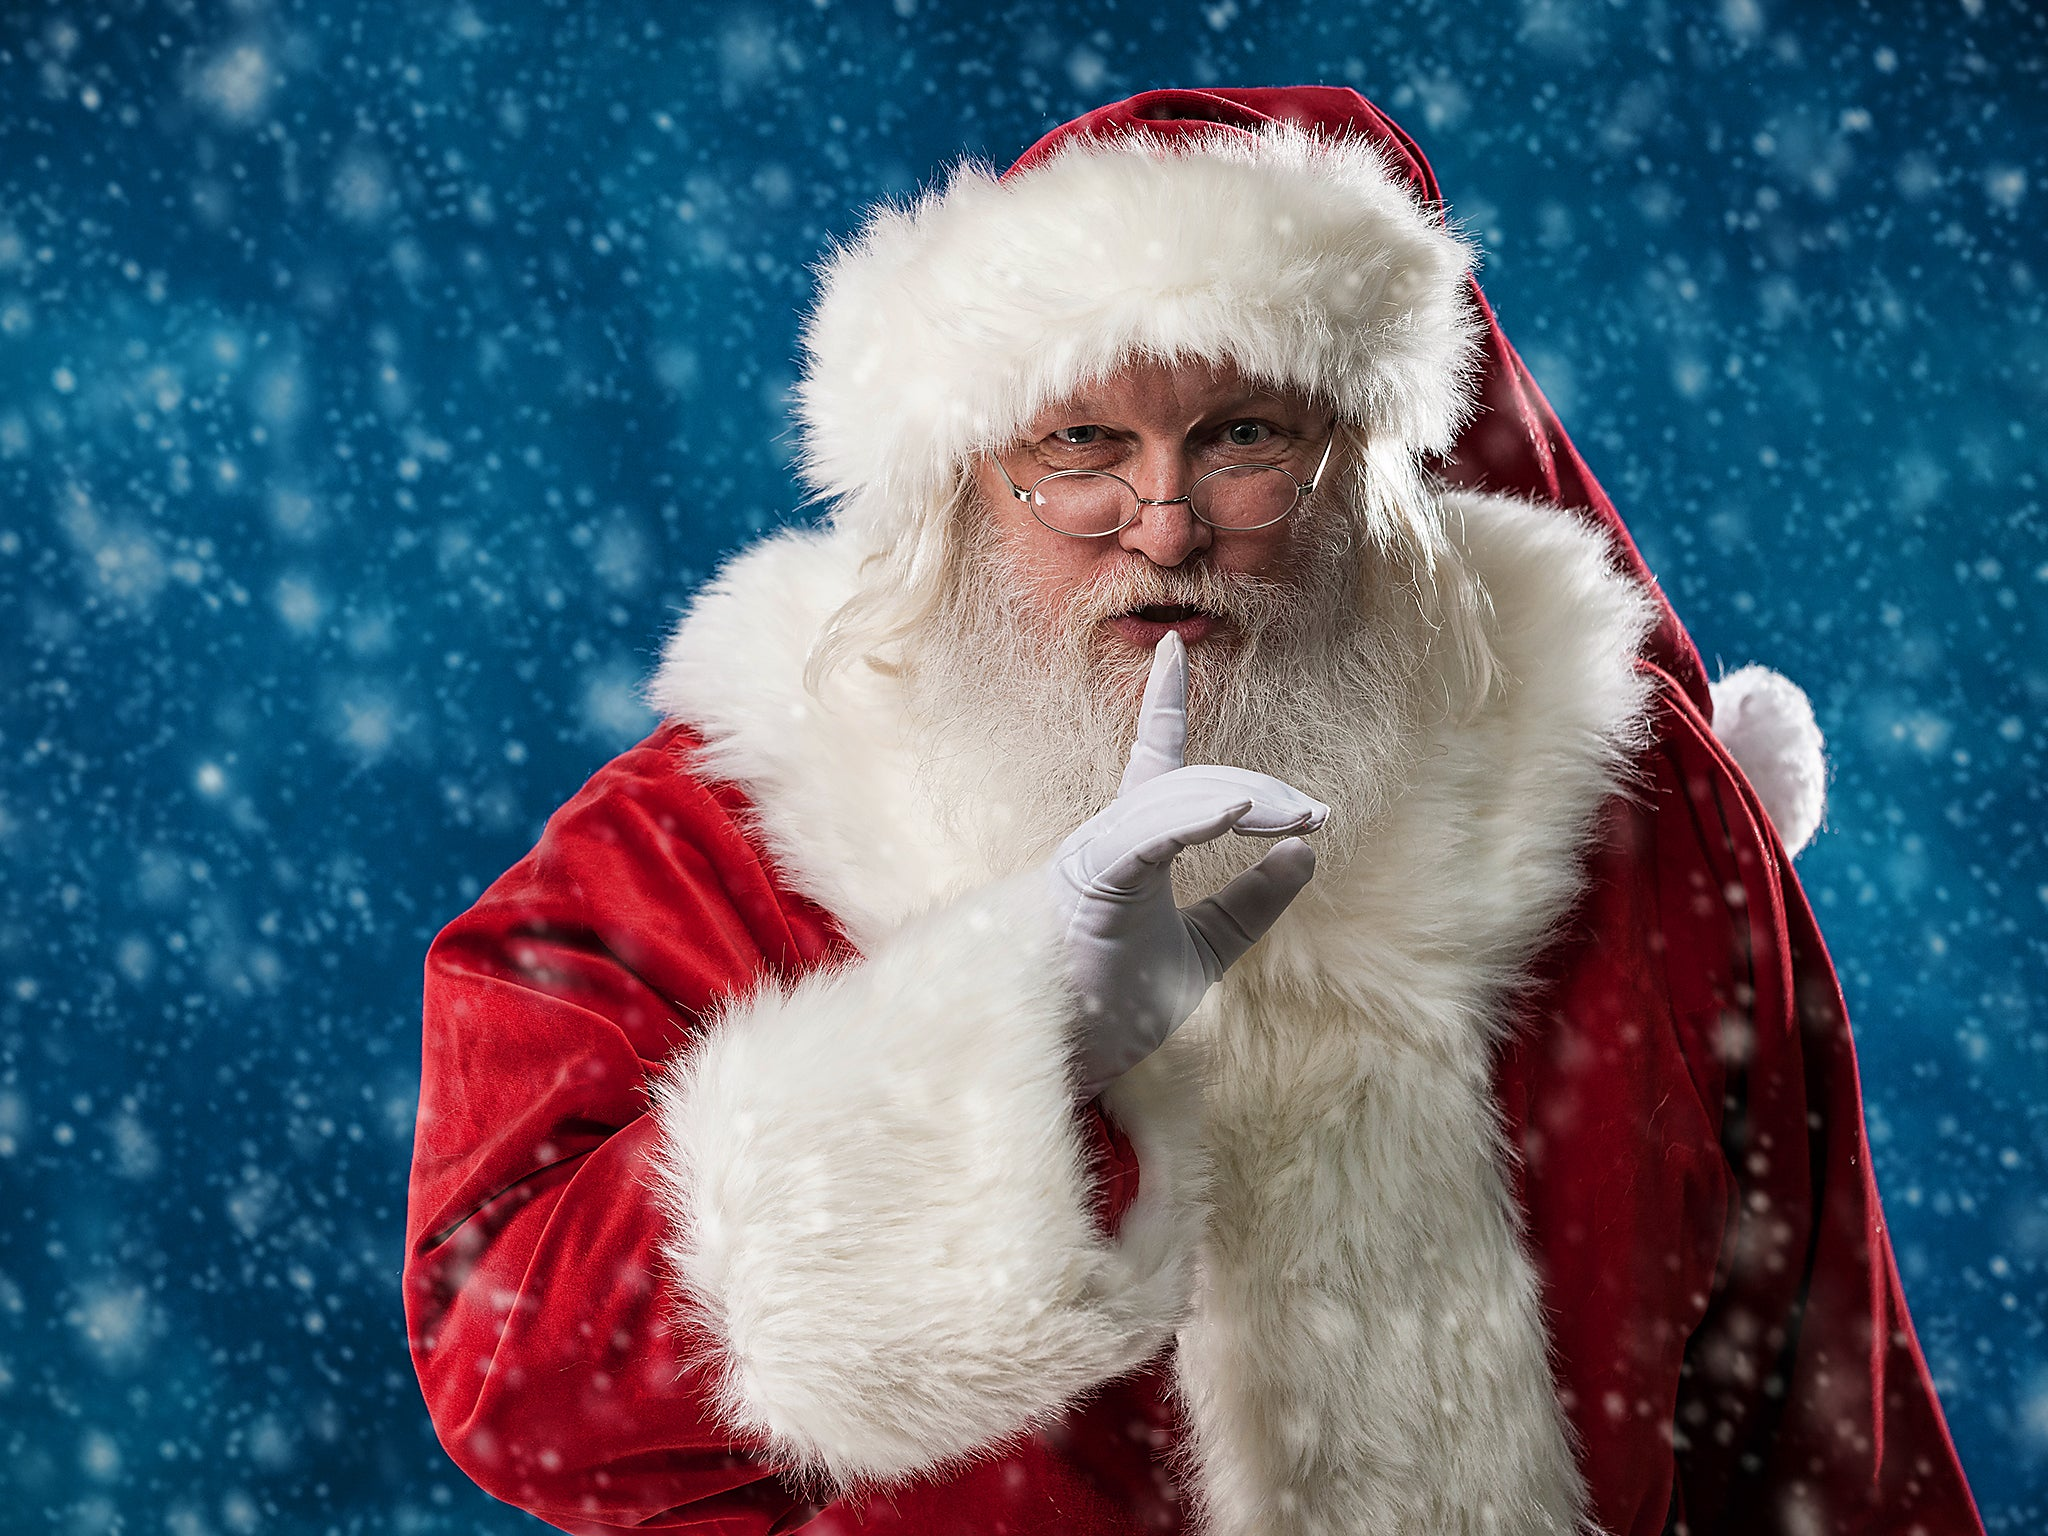 https://static.independent.co.uk/s3fs-public/thumbnails/image/2016/11/23/14/santa.jpg